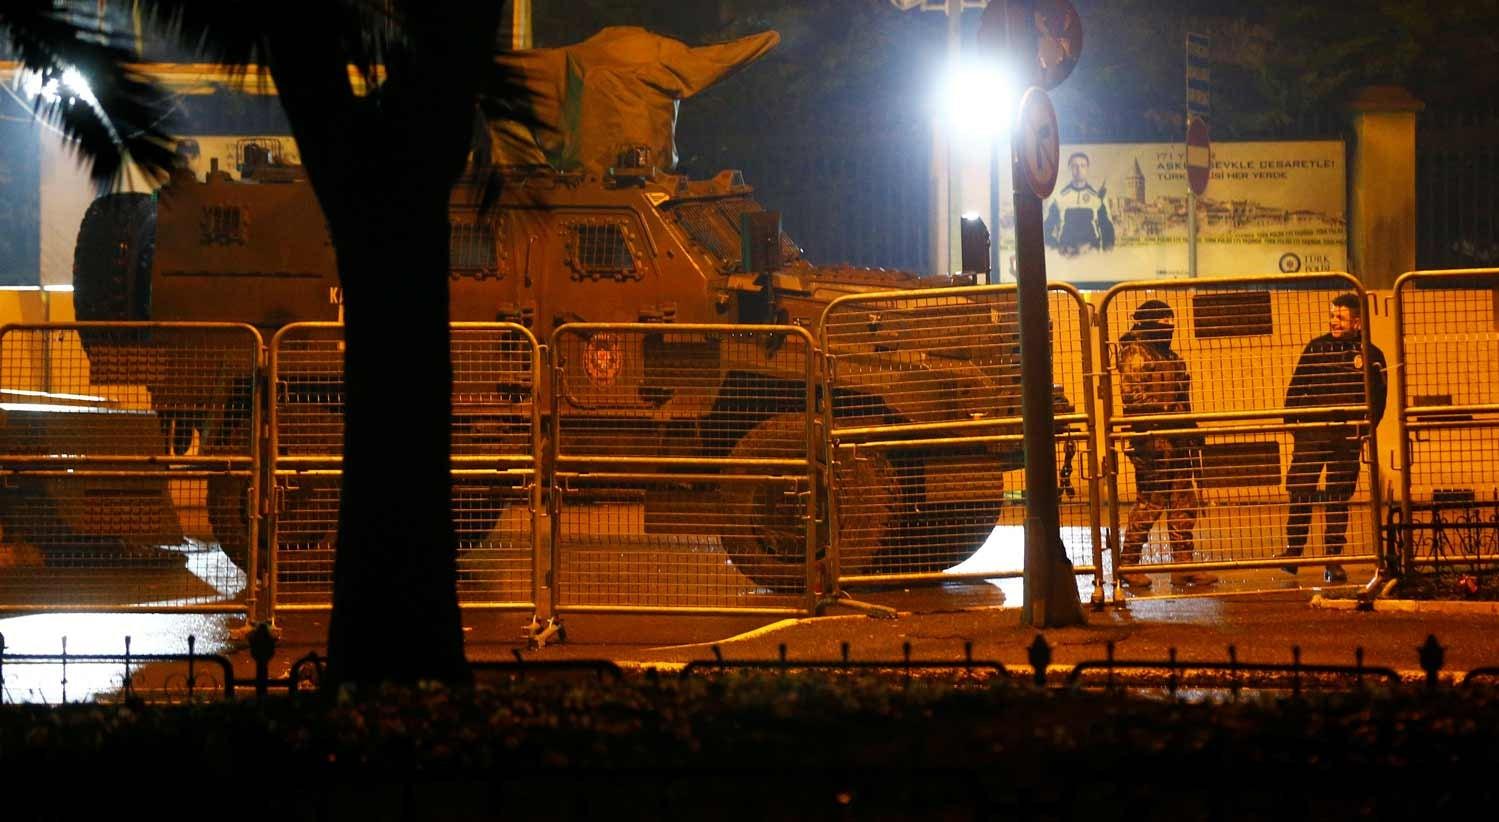 Abdulgadir Masharipov admitiu responsabilidade pelo ataque em Istambul